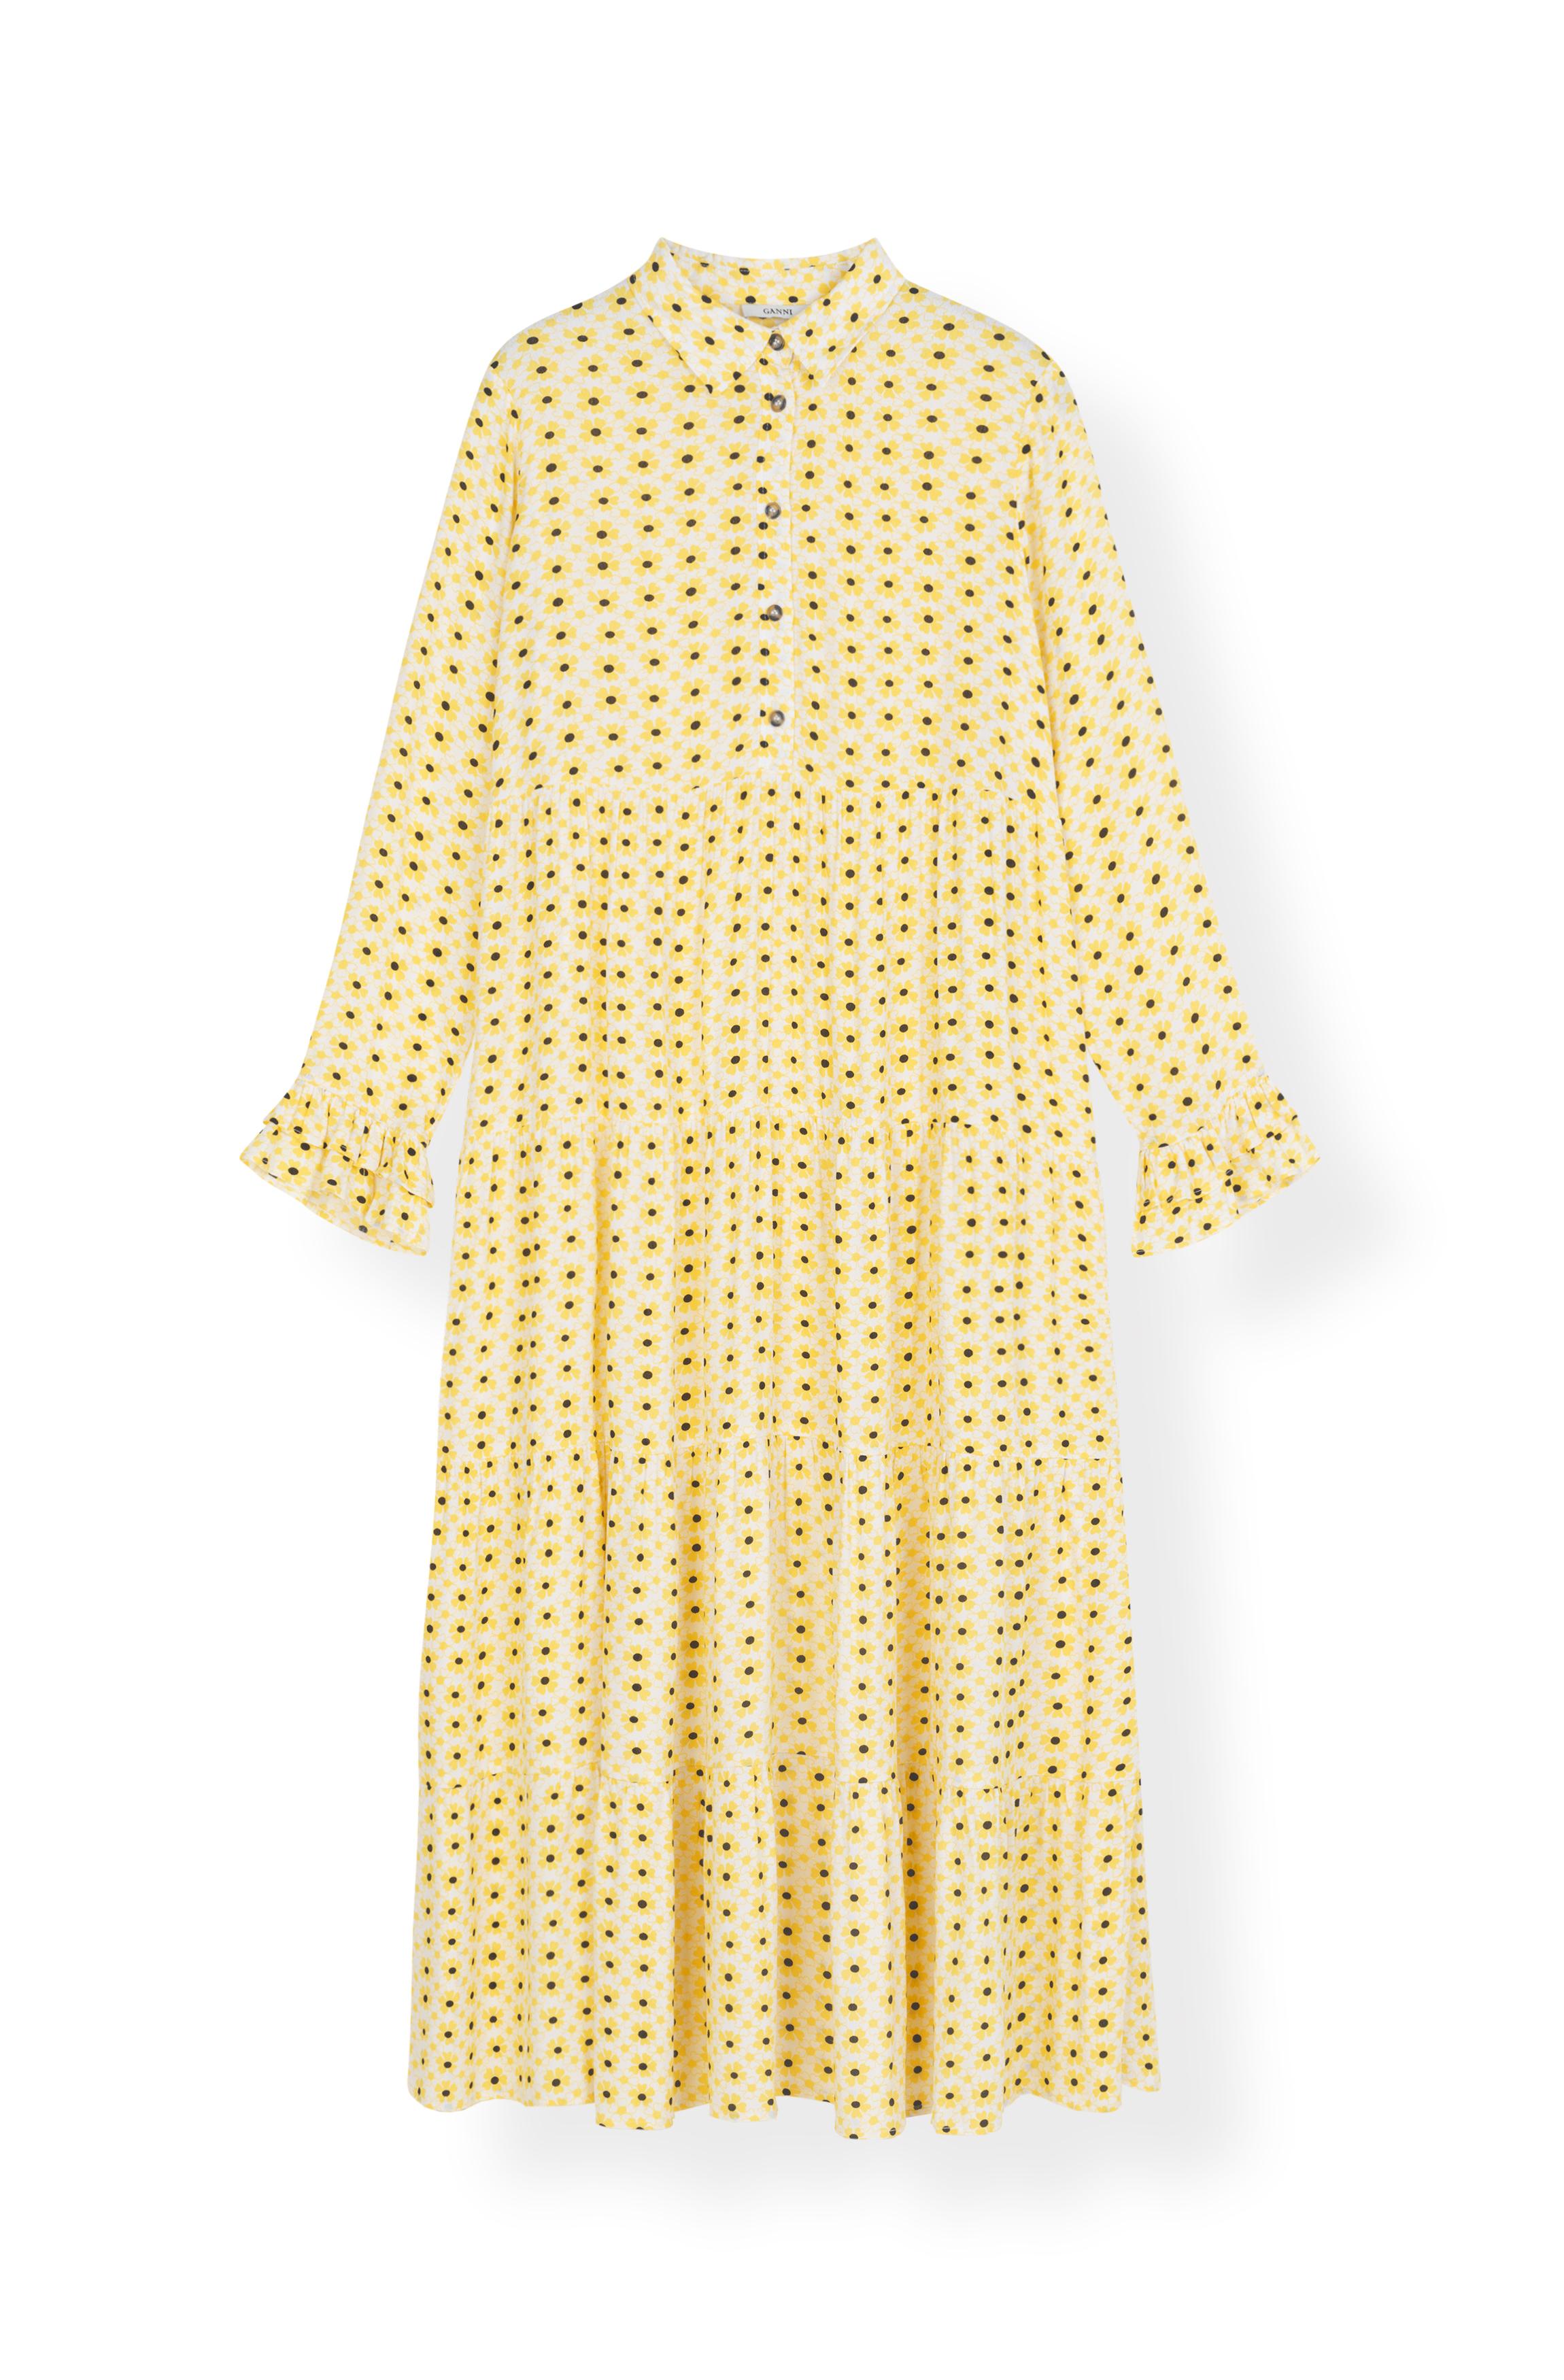 Image of   Ganni F3390 Layer Dress Printed Crepe, 242 Maize